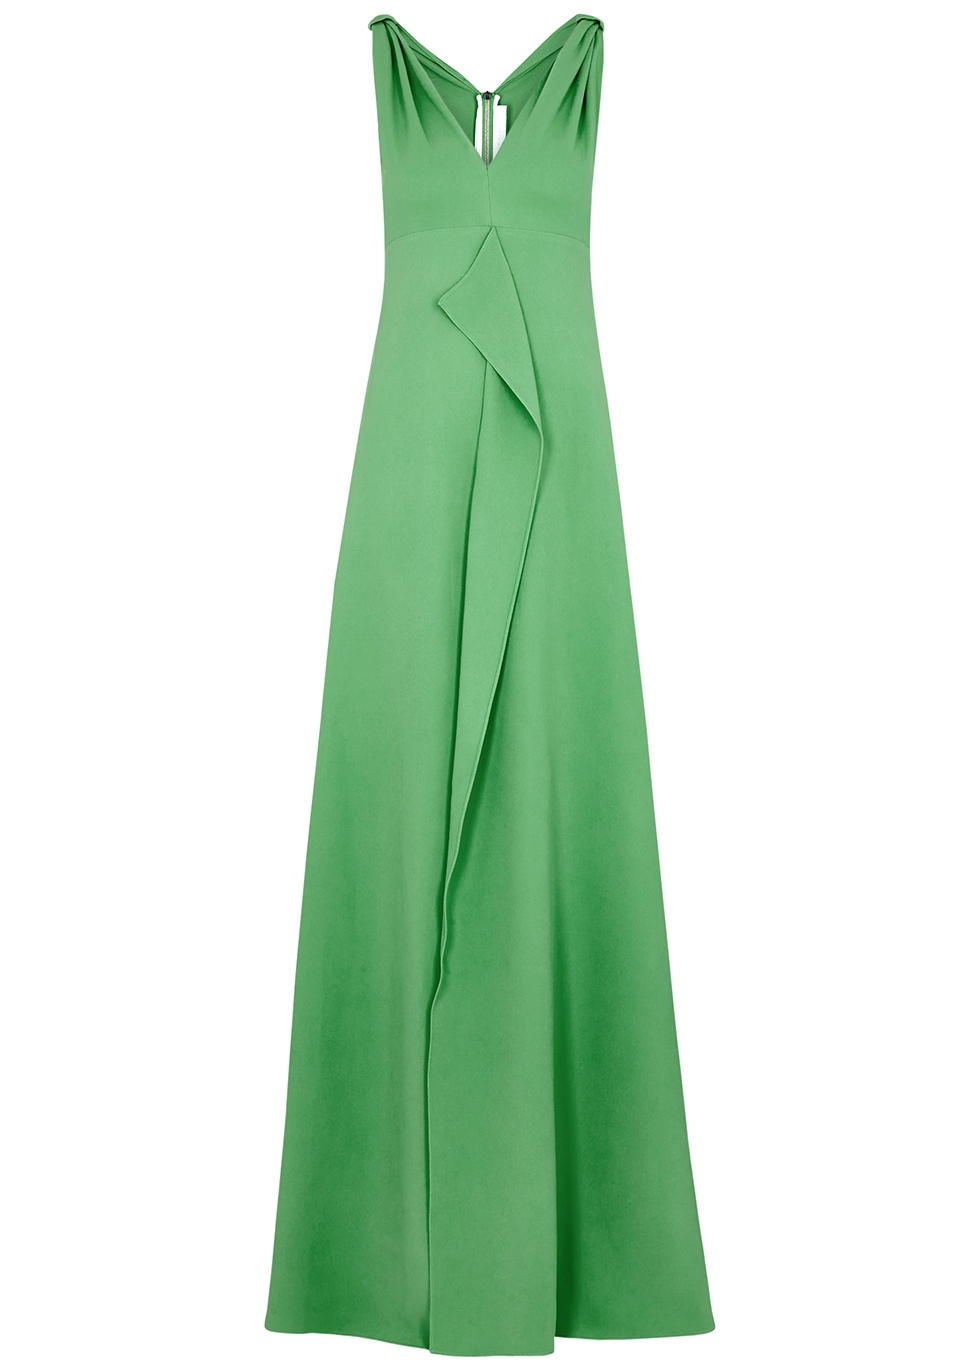 Fuller green cady gown